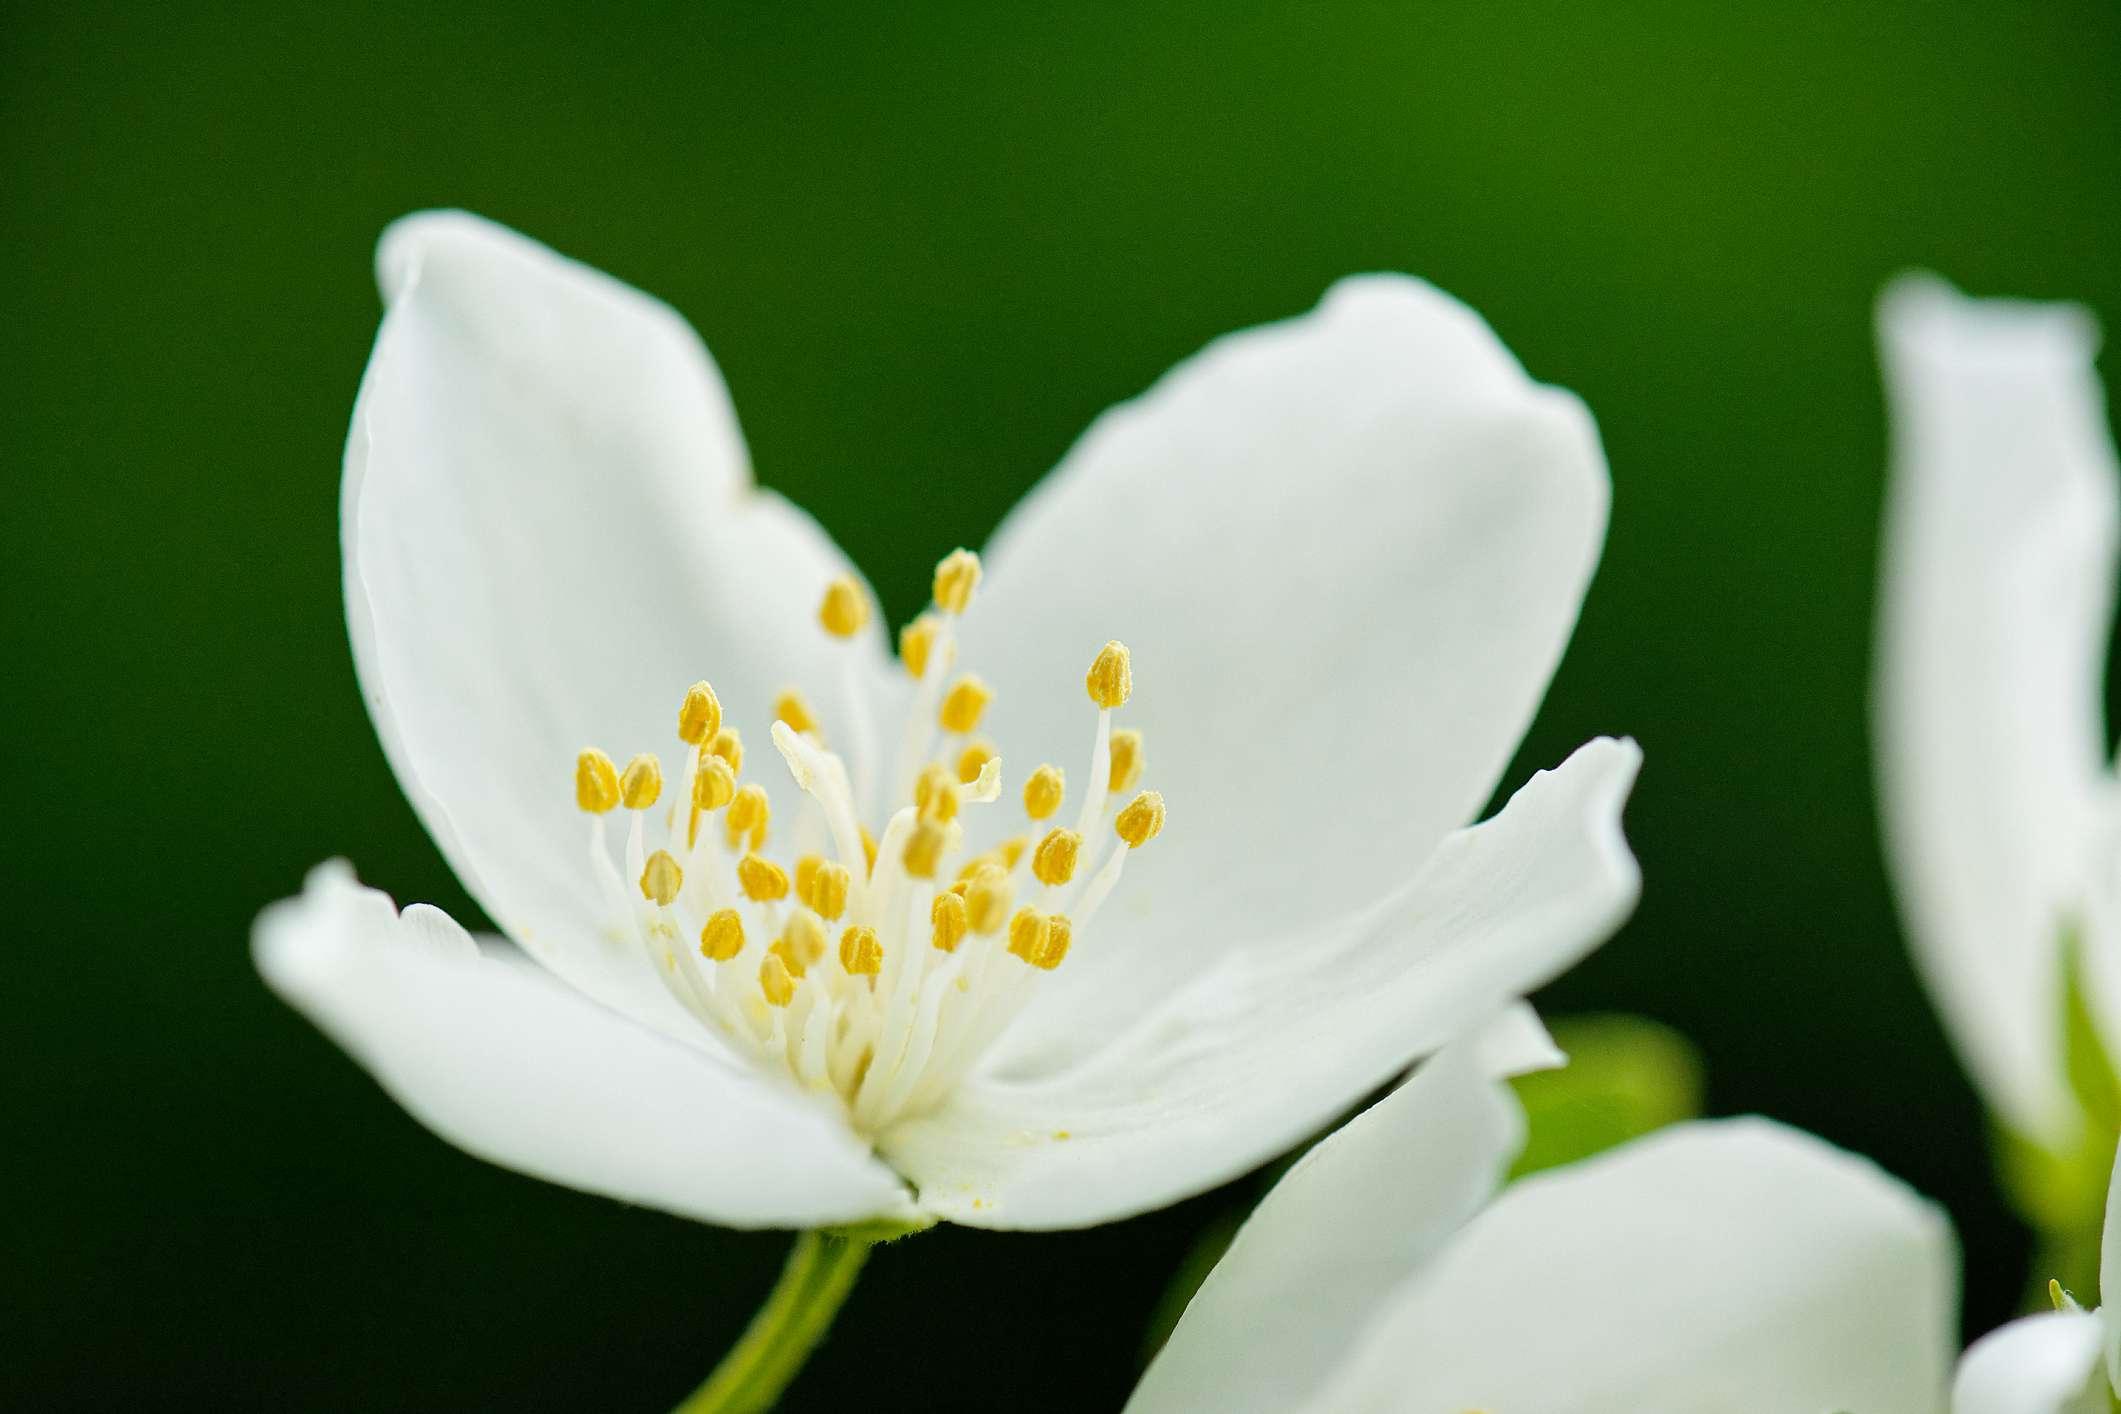 Flower of Philadelphus inodorus